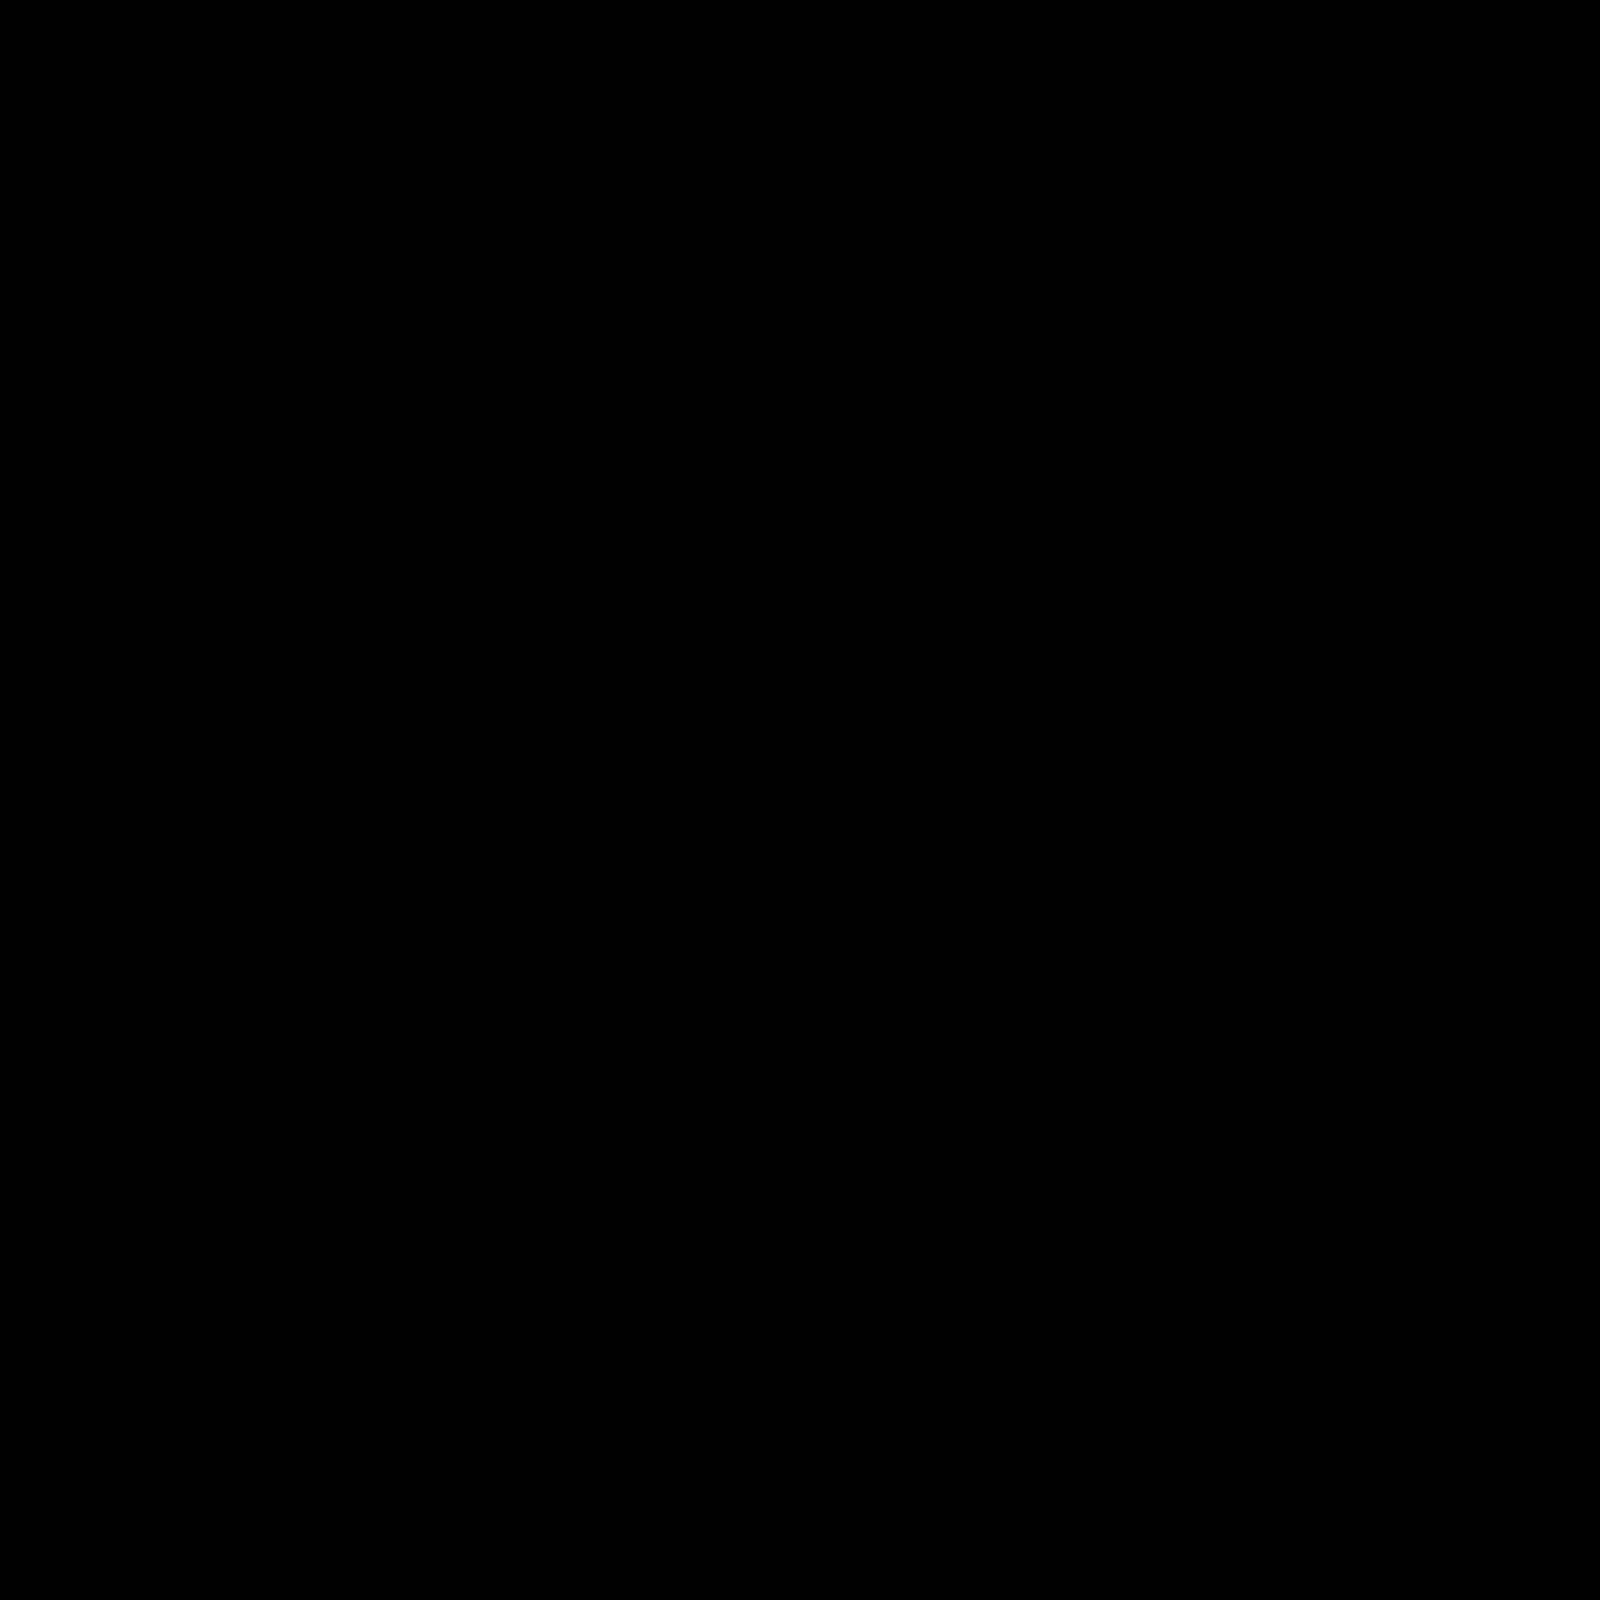 Ognista łopata icon